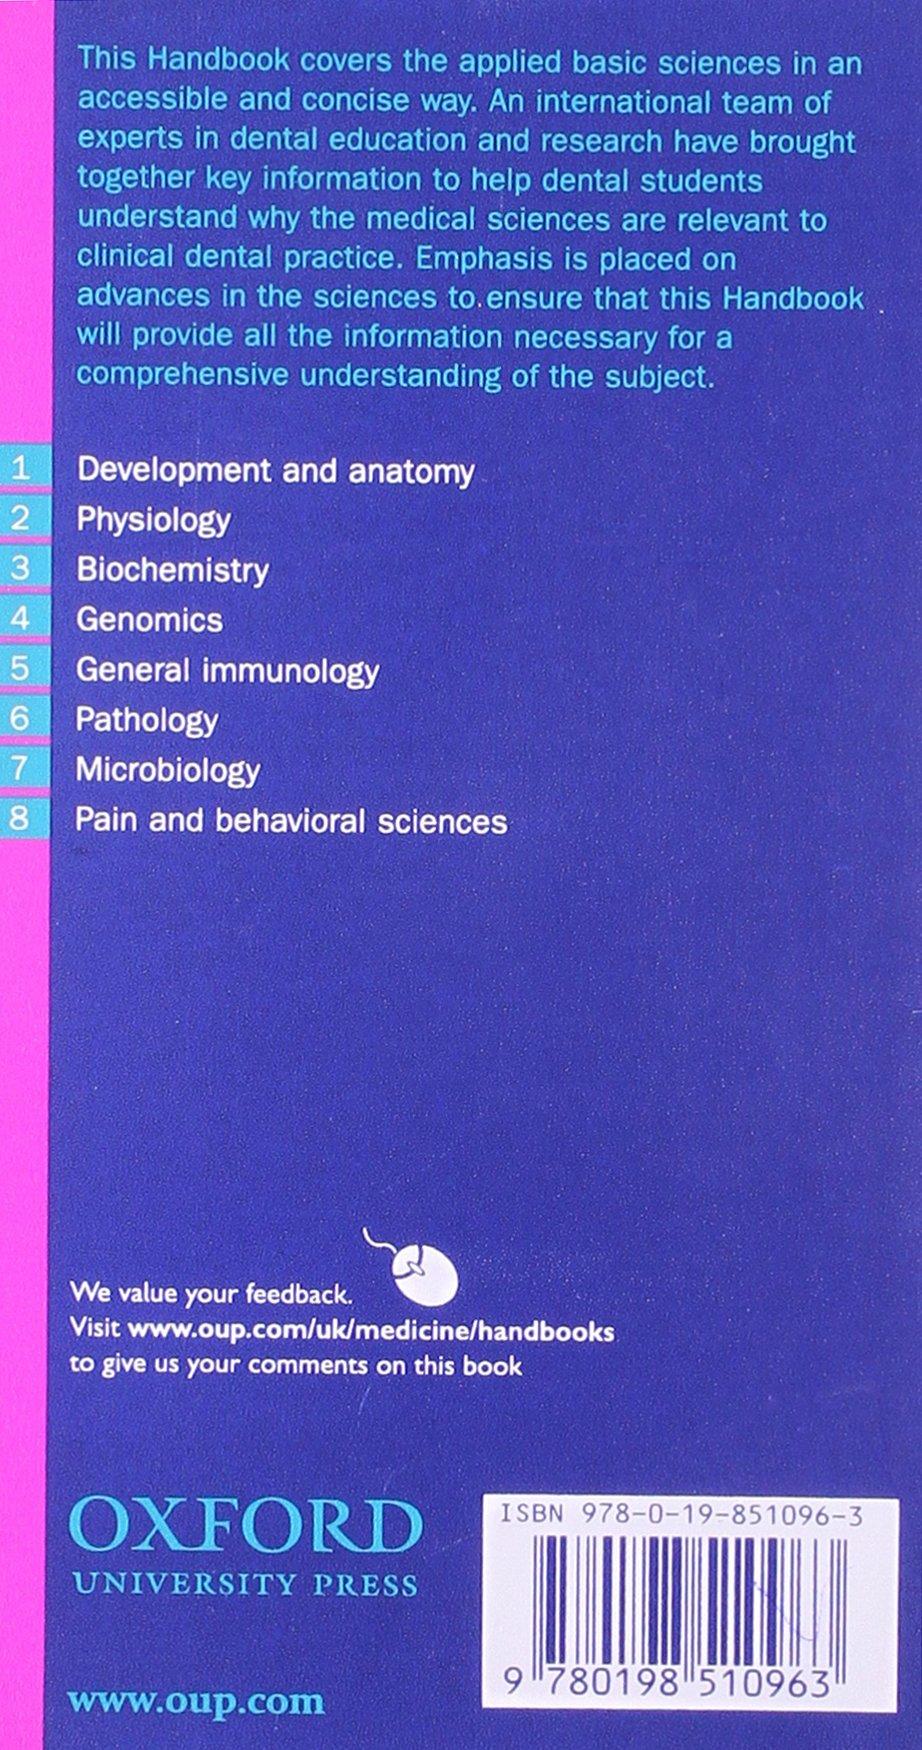 Dental book oxford